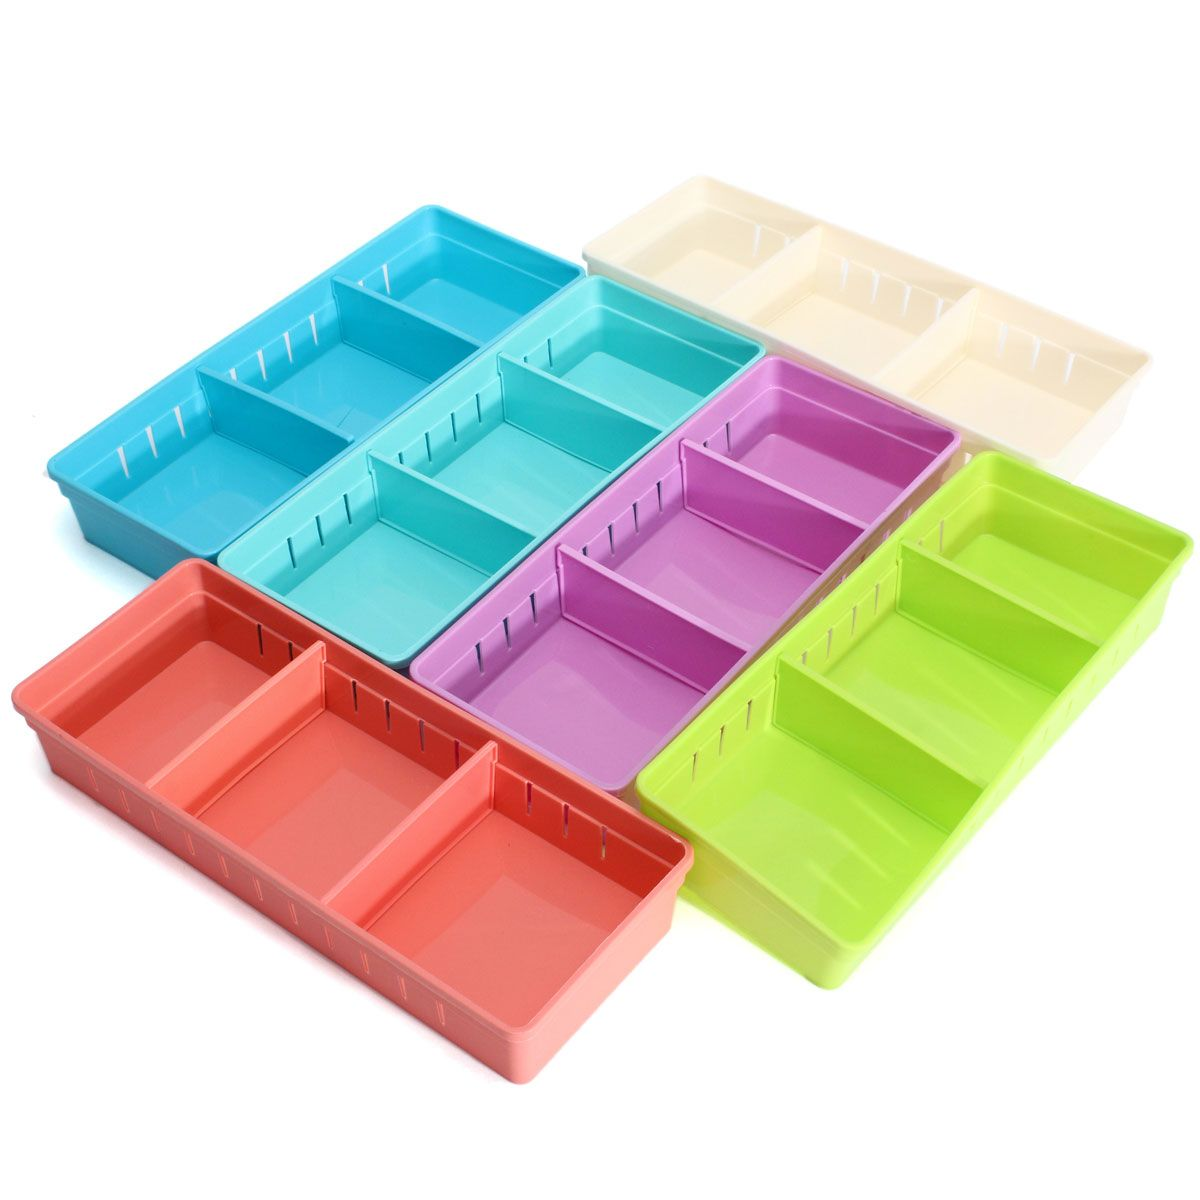 Adjustable Makeup Storage Box Drawer Home Kitchen Jewelry Organizer